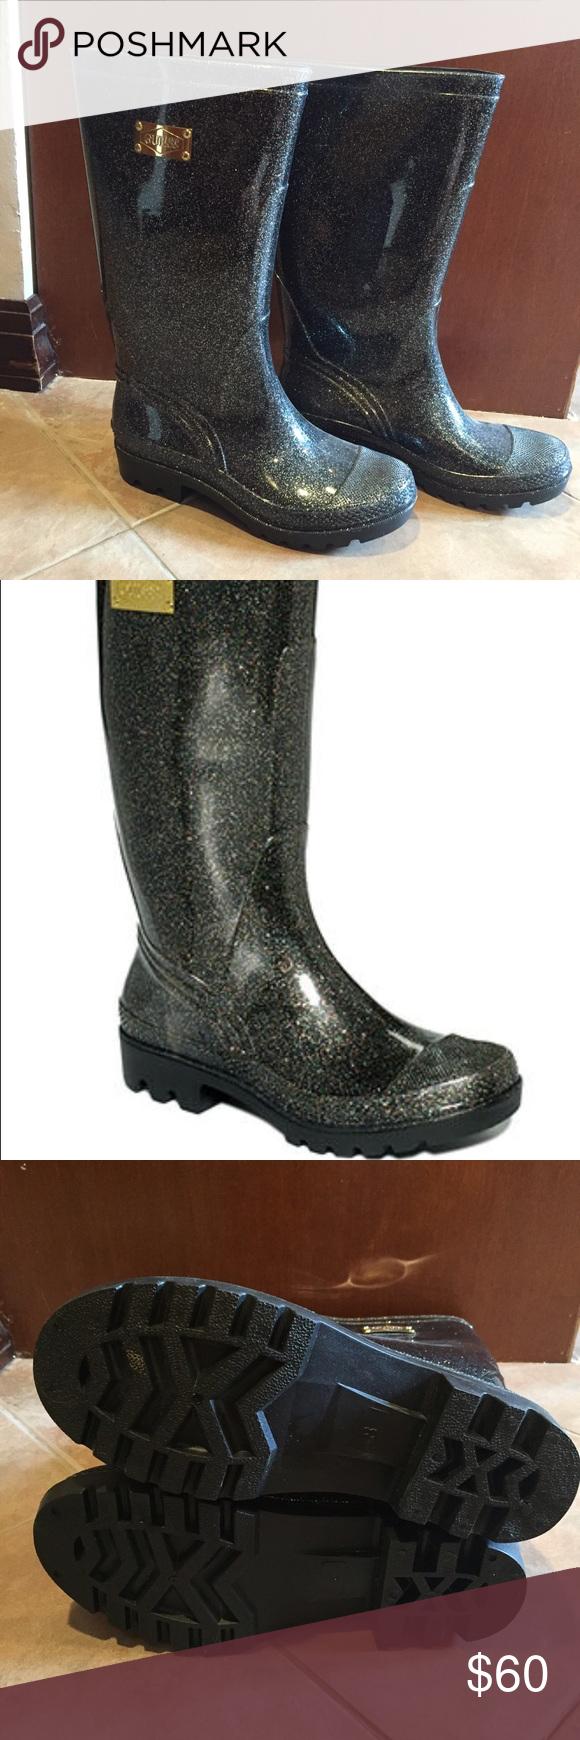 Guess glitter sparkle rain boots. Size